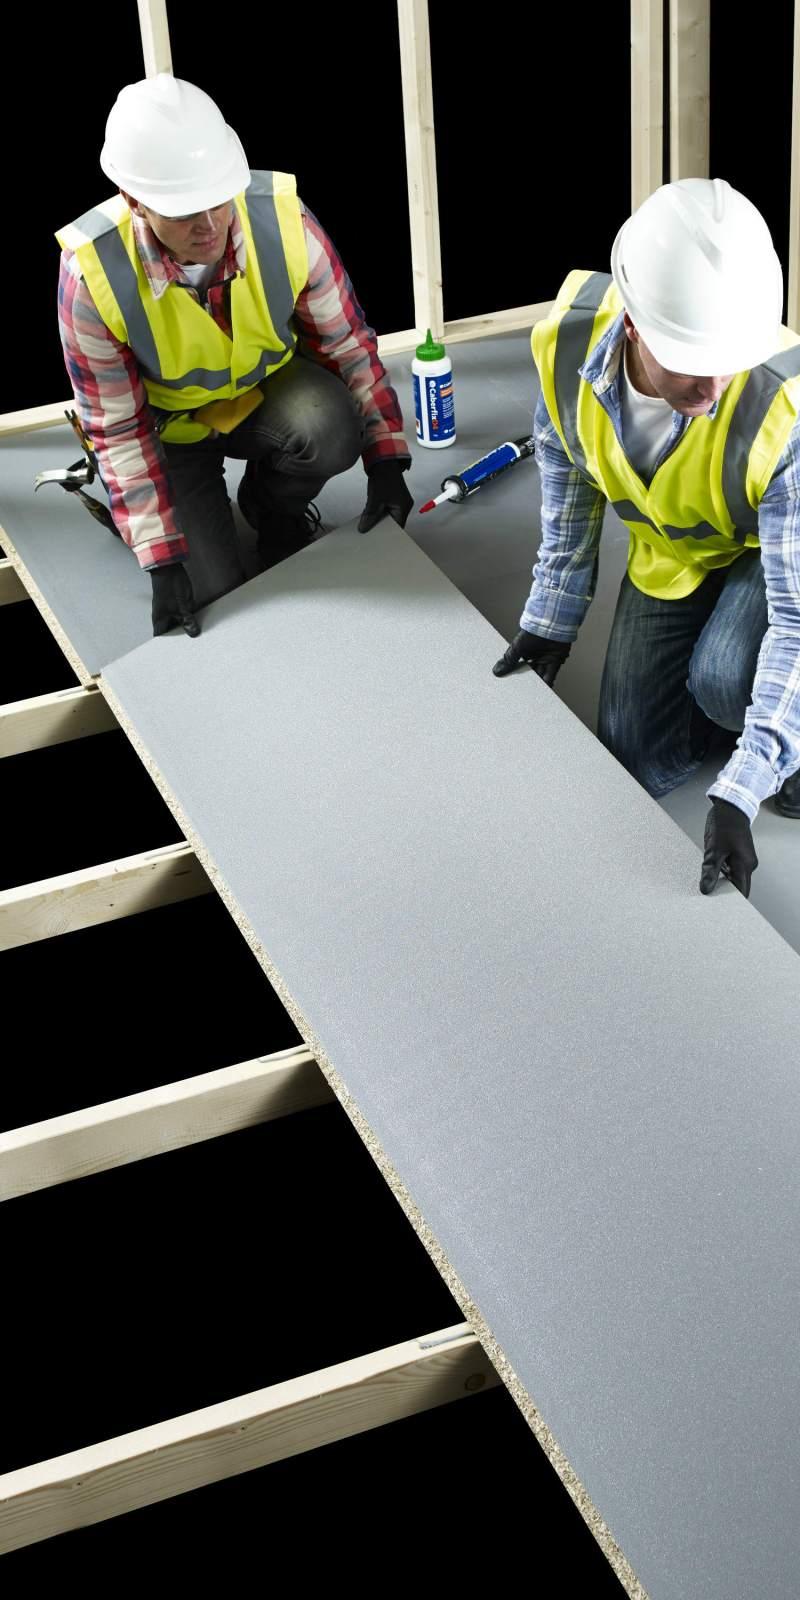 Norbord Cabershield: A new generation of weatherproof flooring